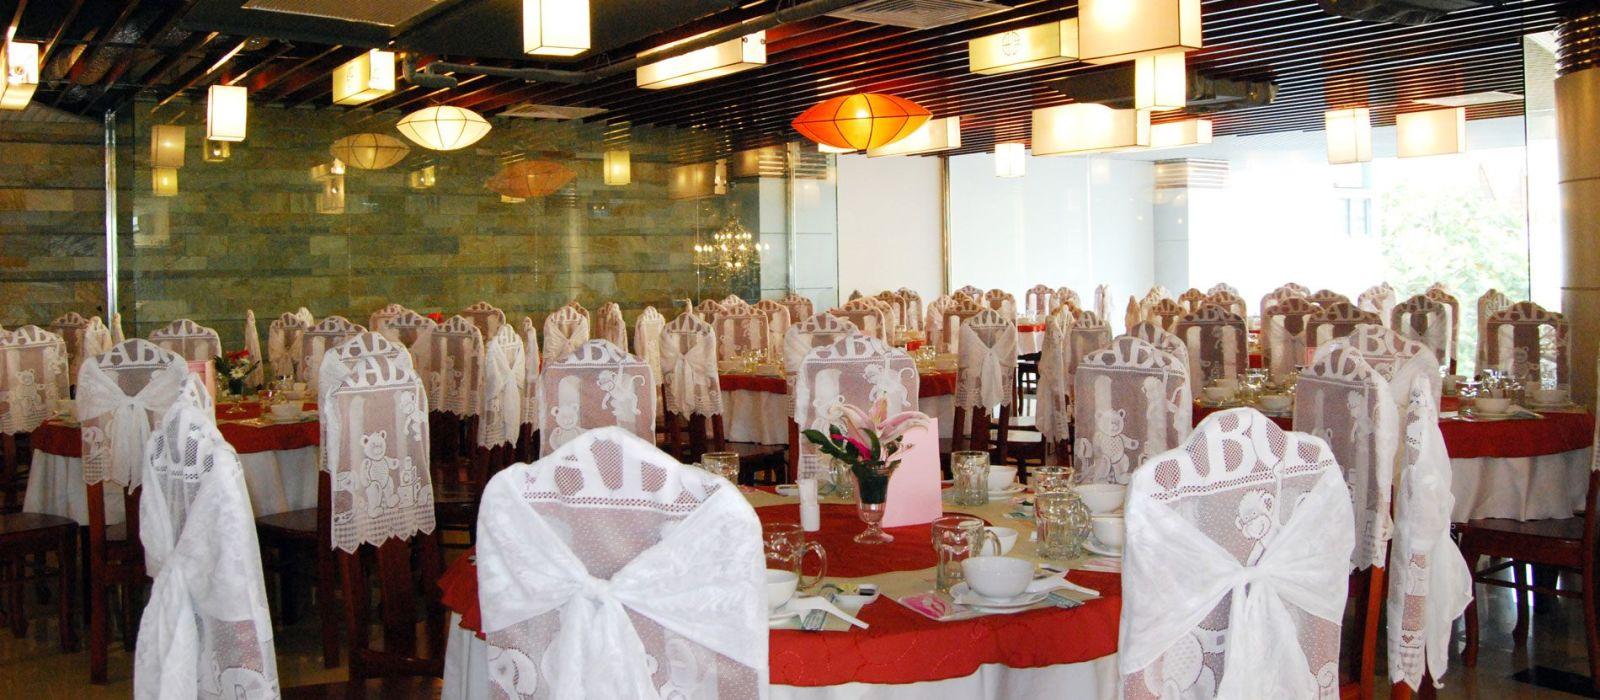 Hotel Kim Tho (Can Tho) Vietnam